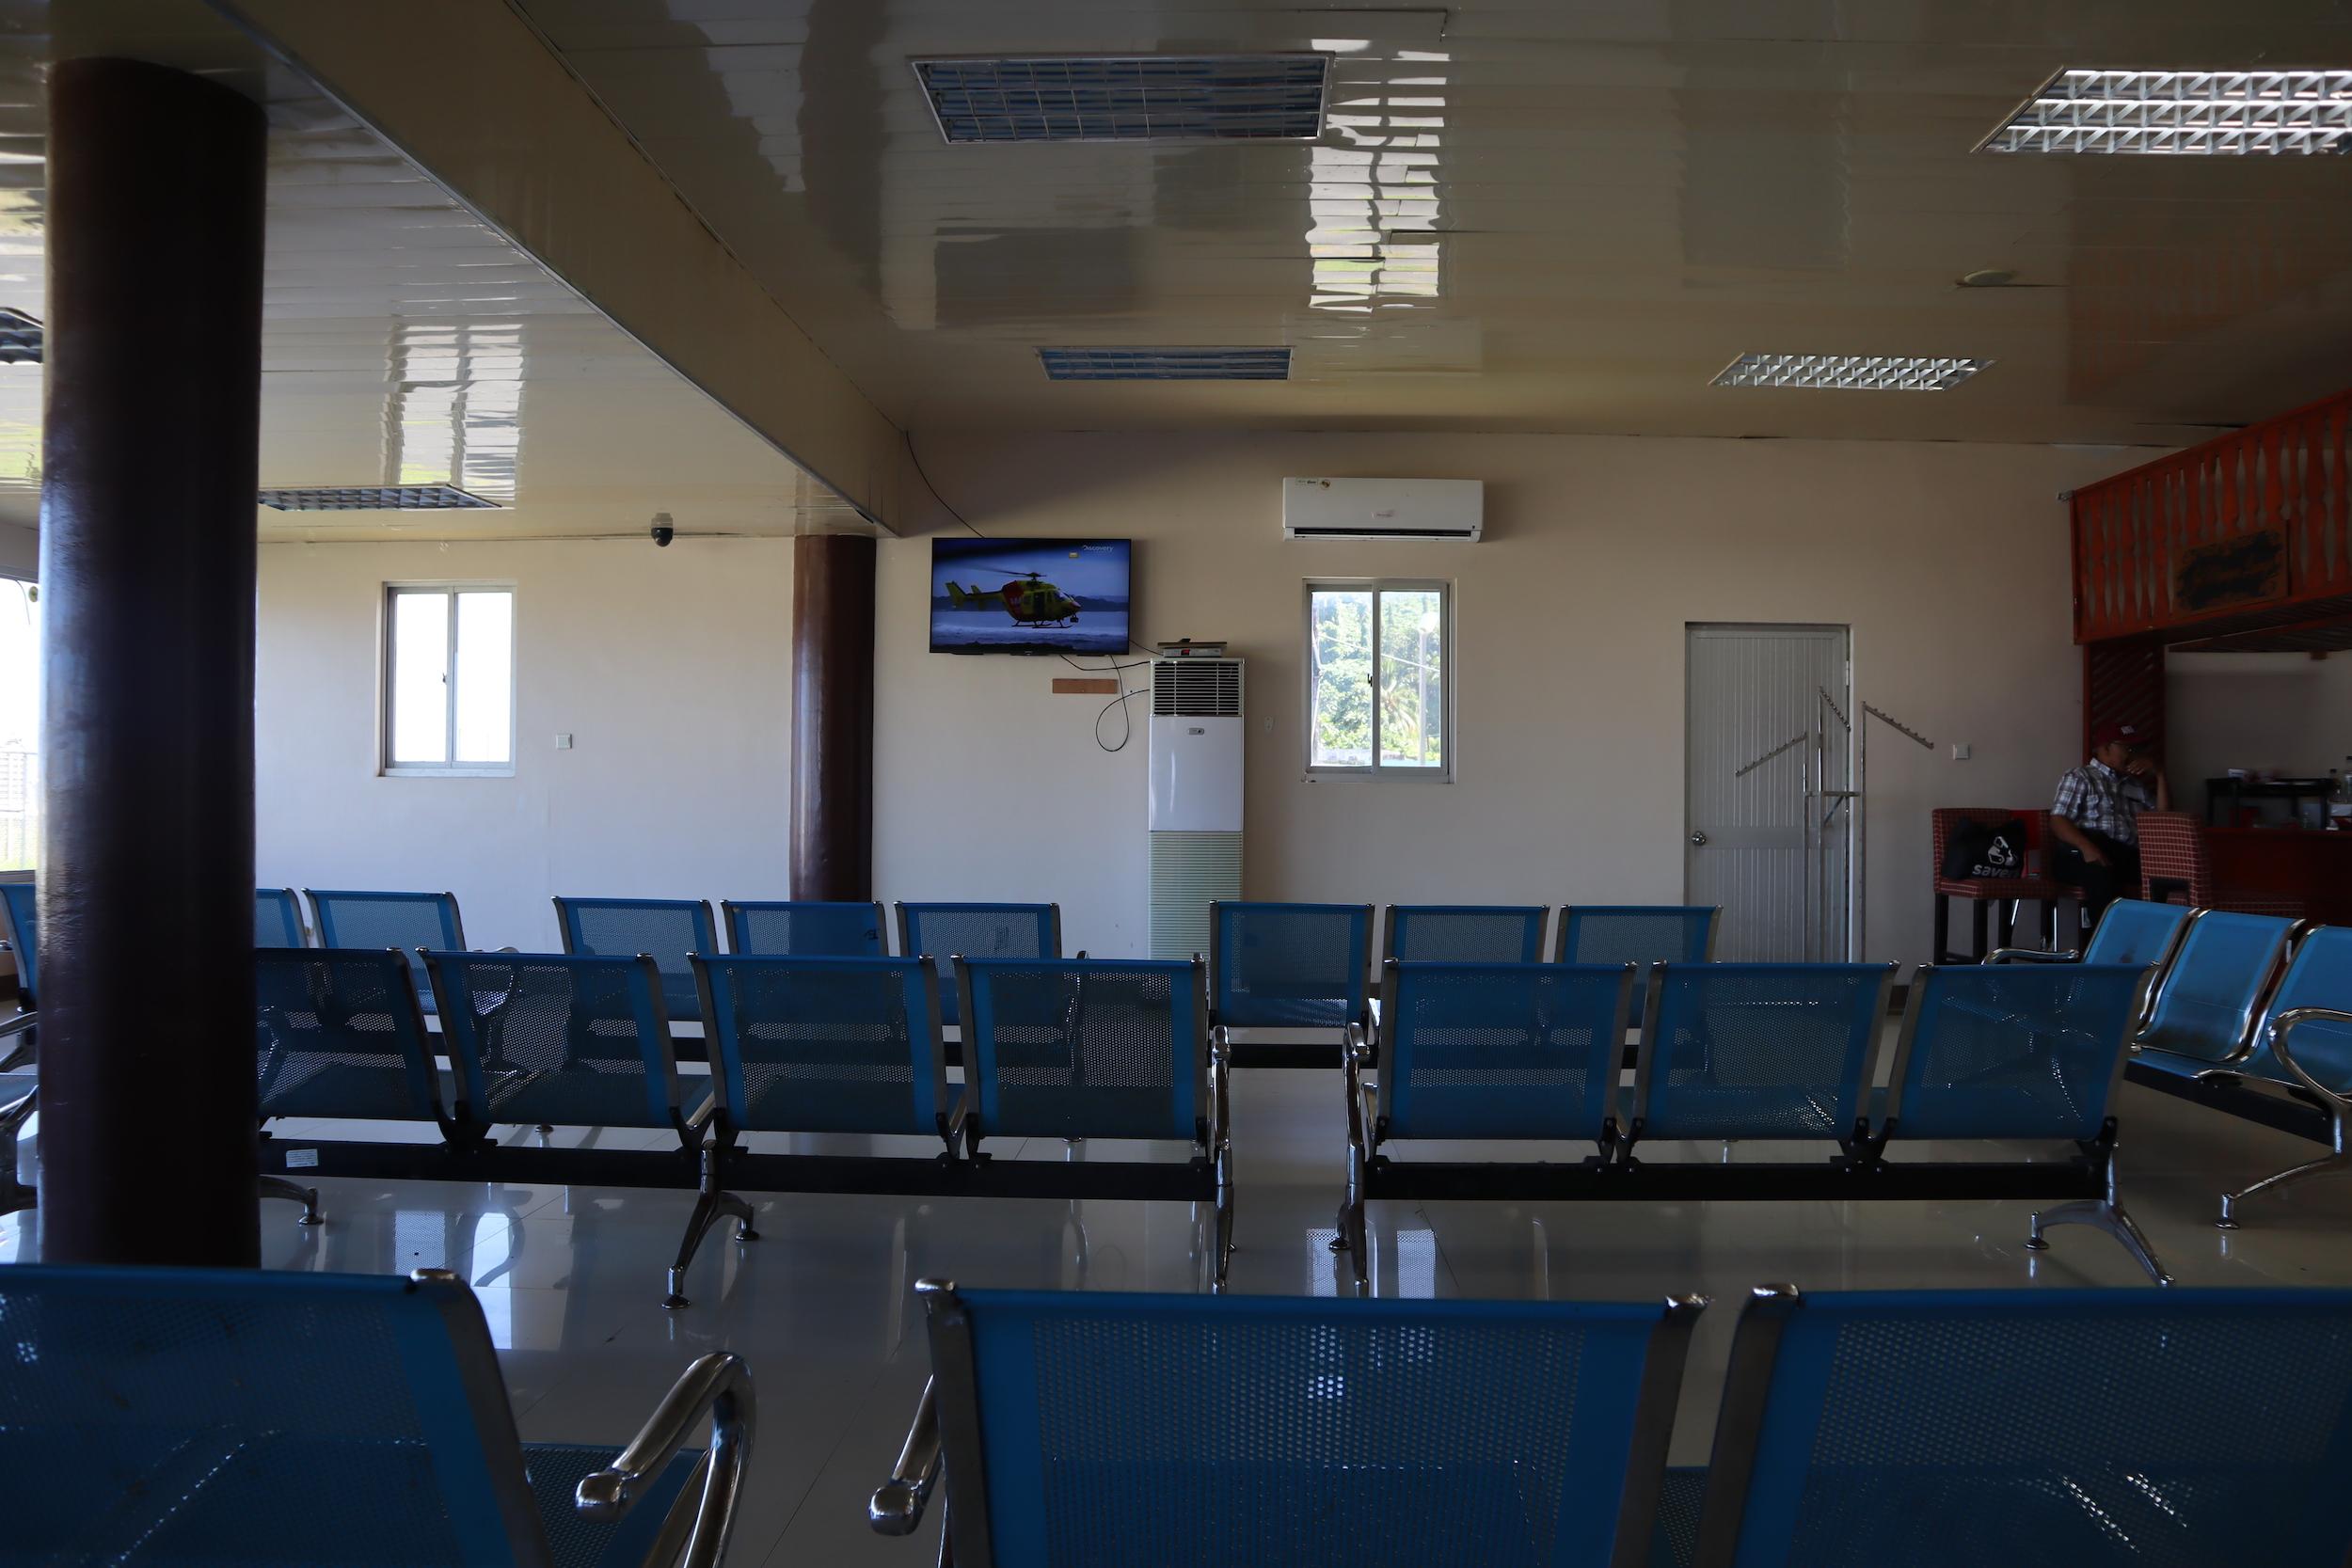 Chuuk International Airport – Waiting area